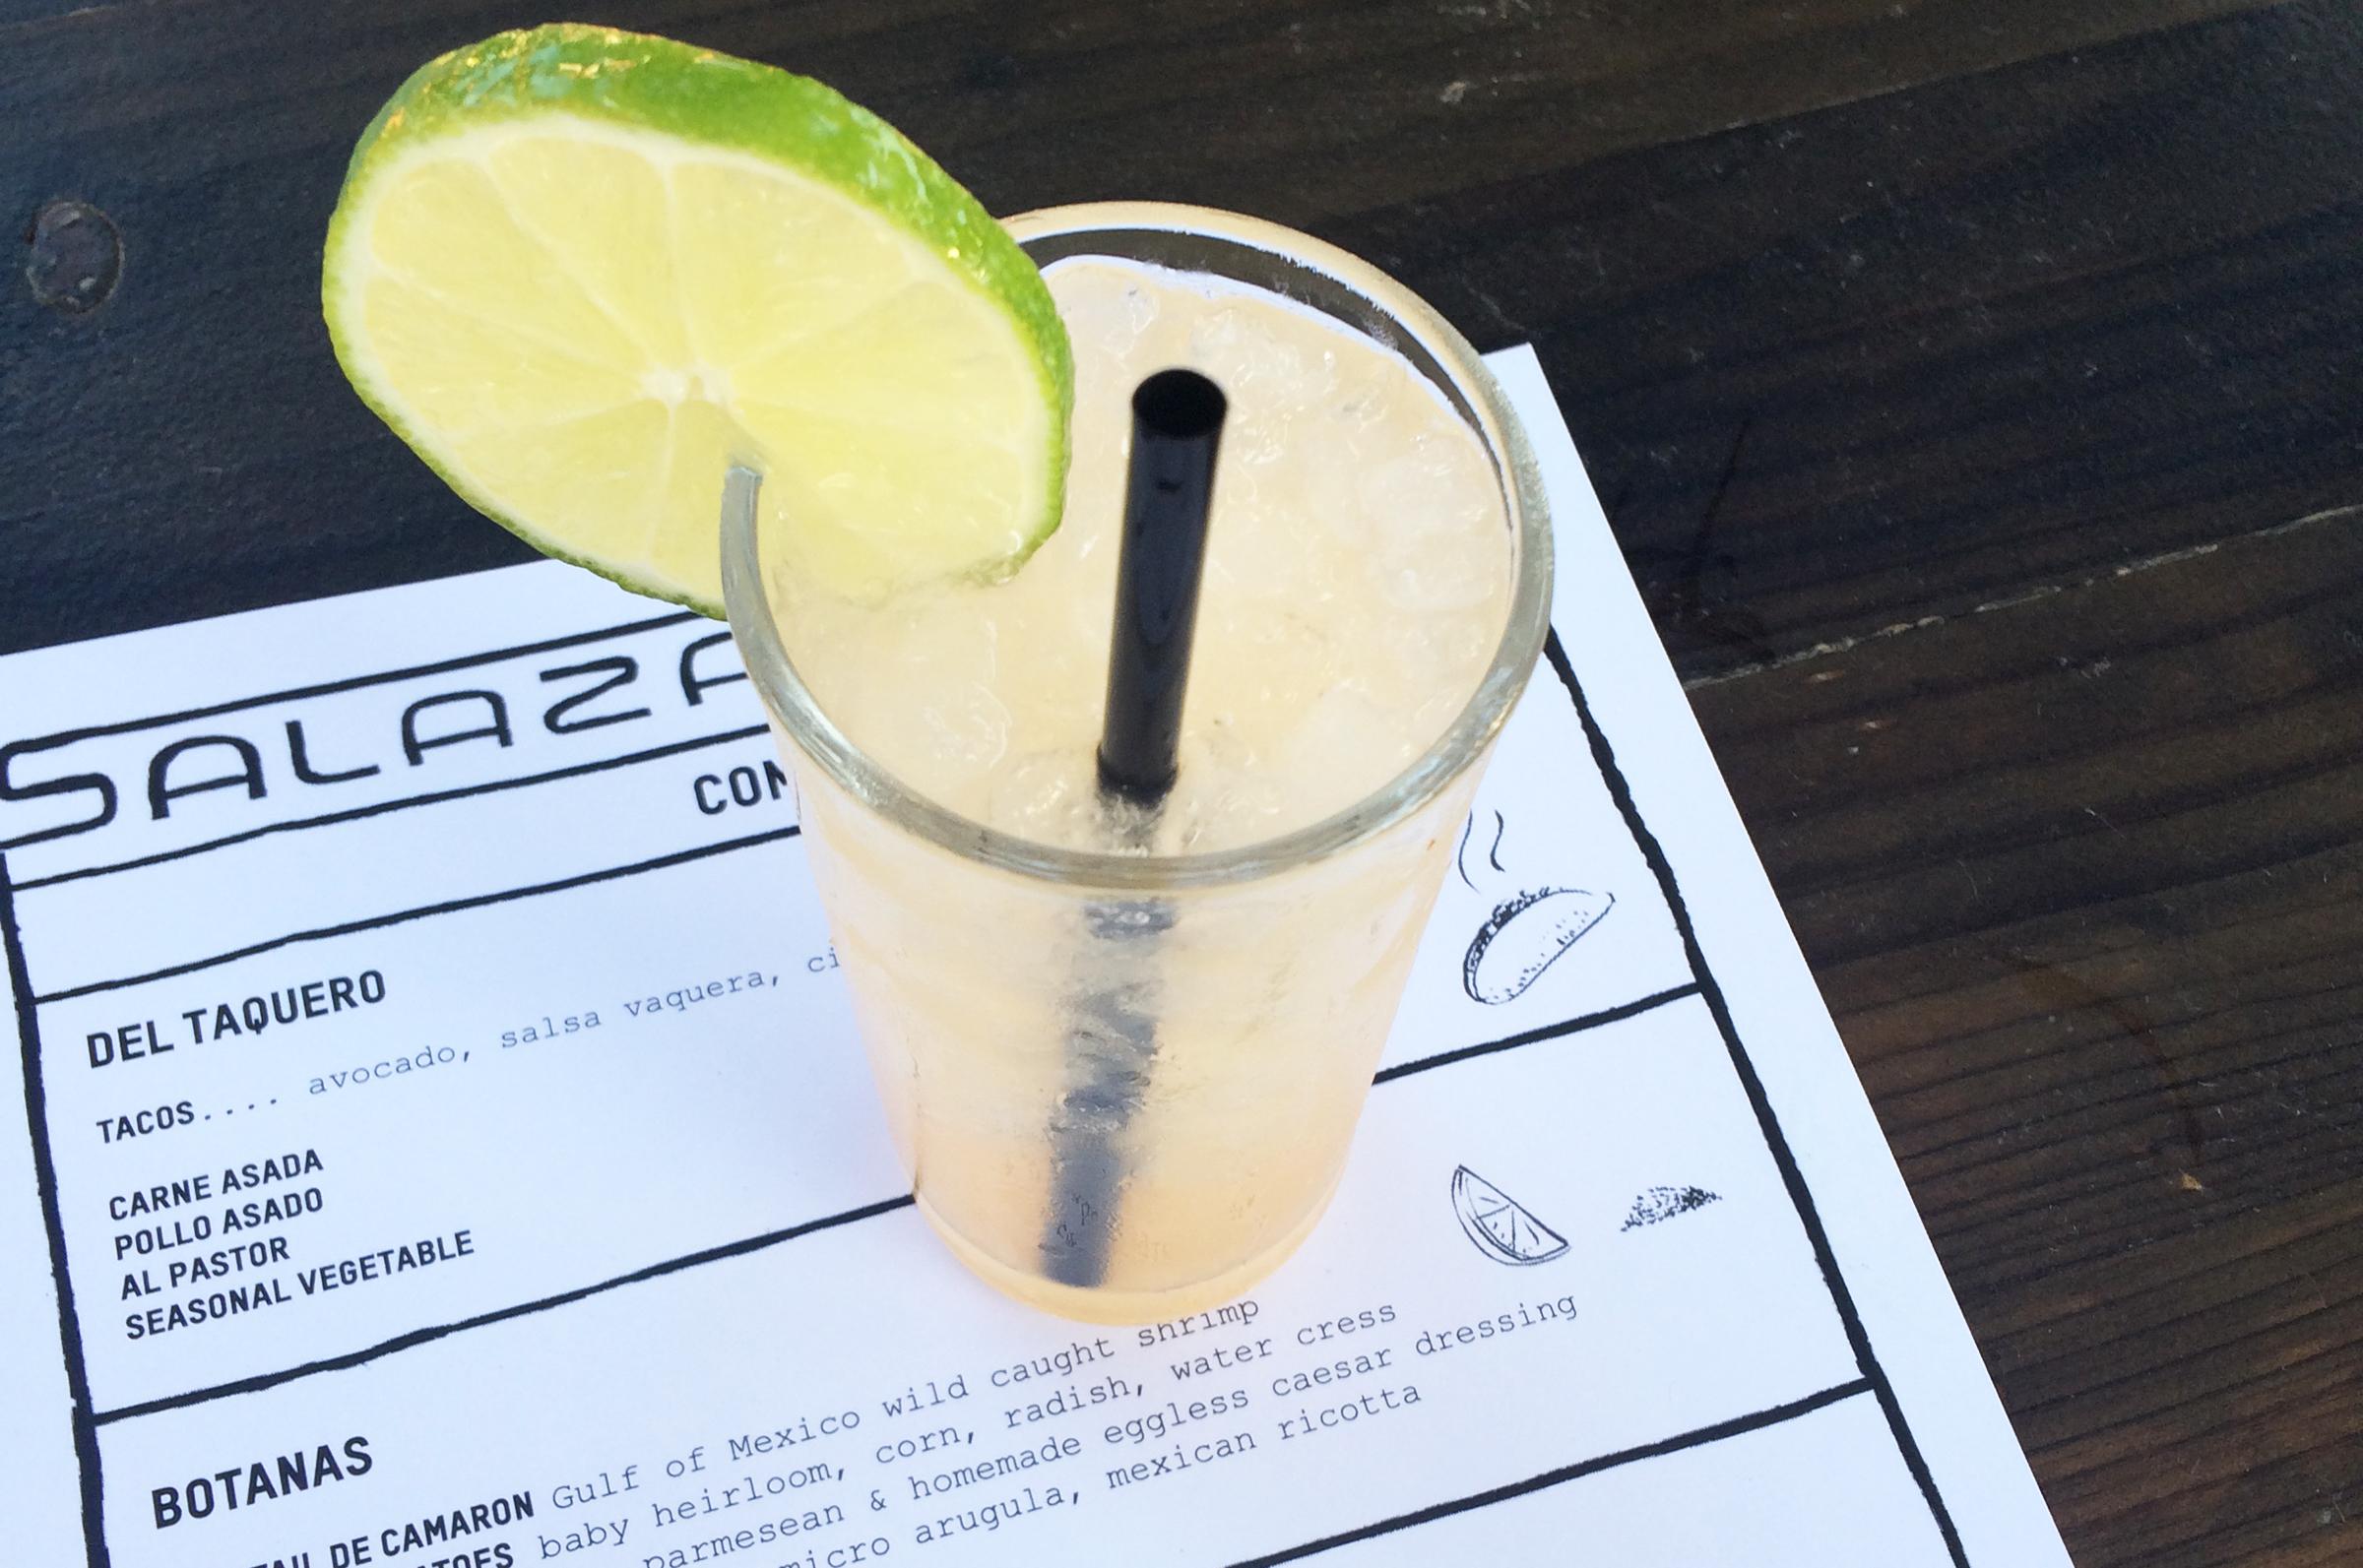 La Paloma: Mezcal, Ancho Chili Liquor, Grapefruit, Honey, and Salt